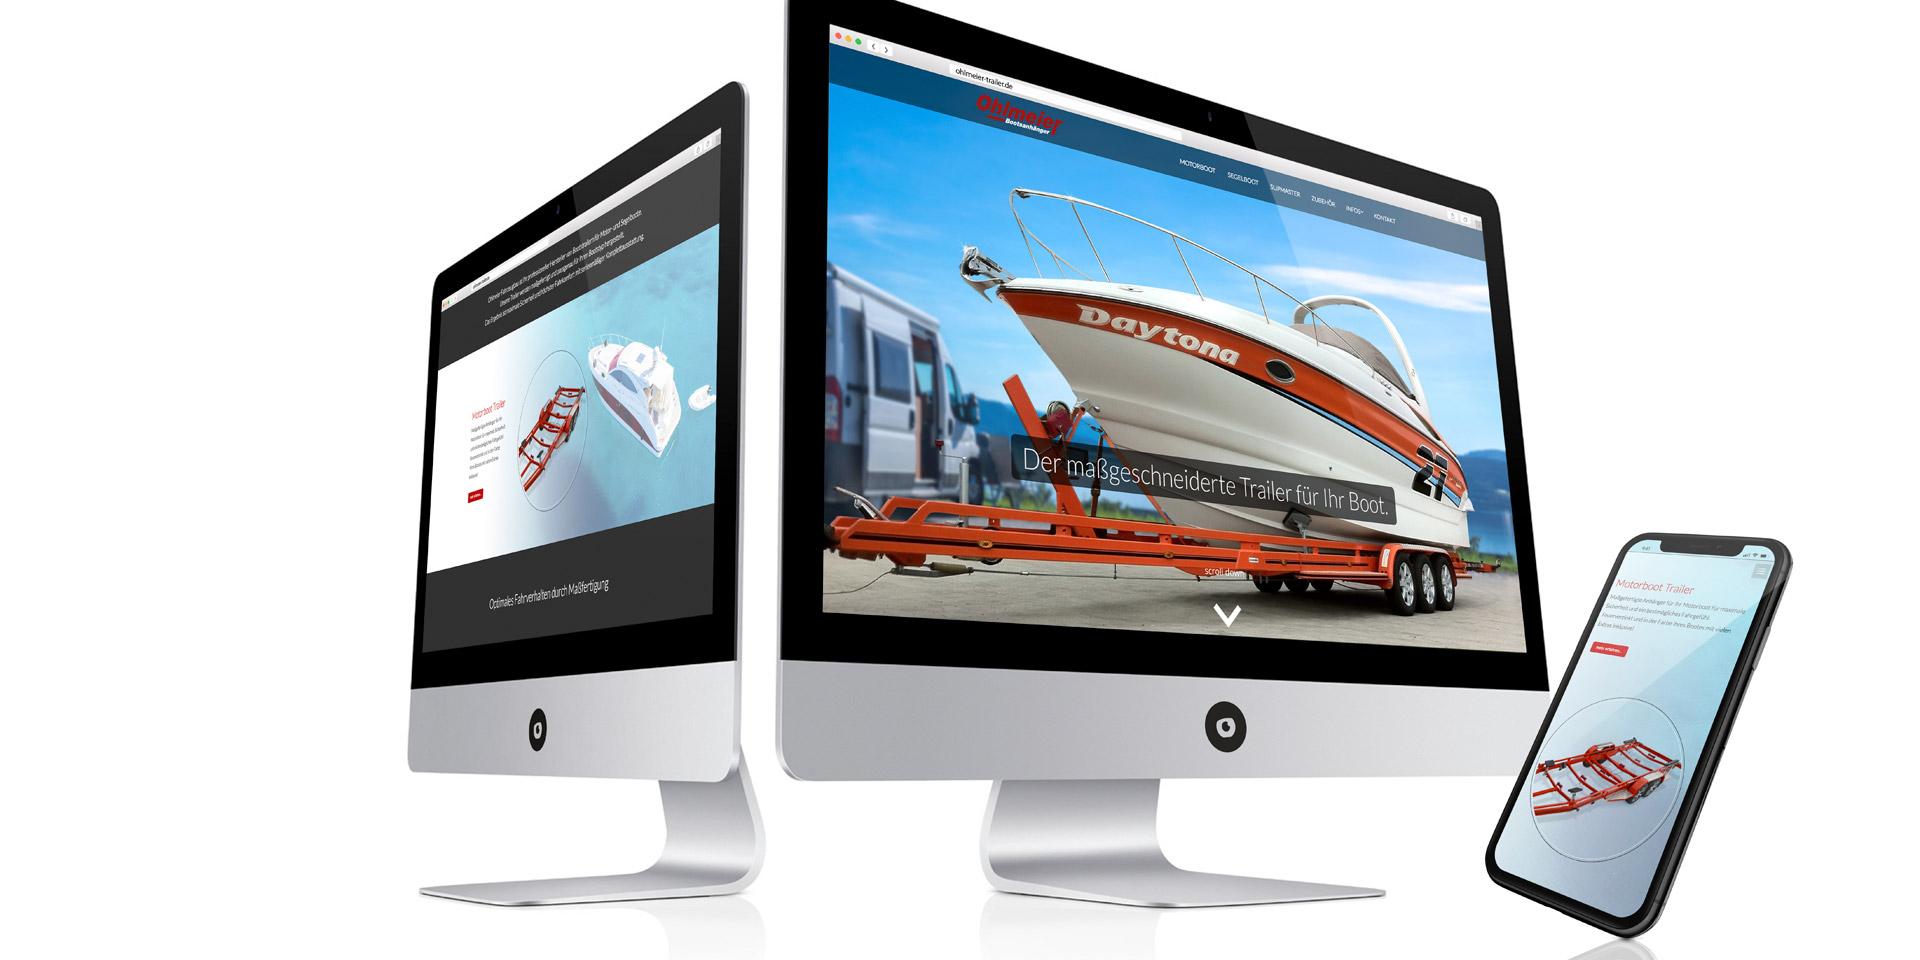 Vom Webdesigner: Ohlmeier Bootsanhänger Internetauftritt